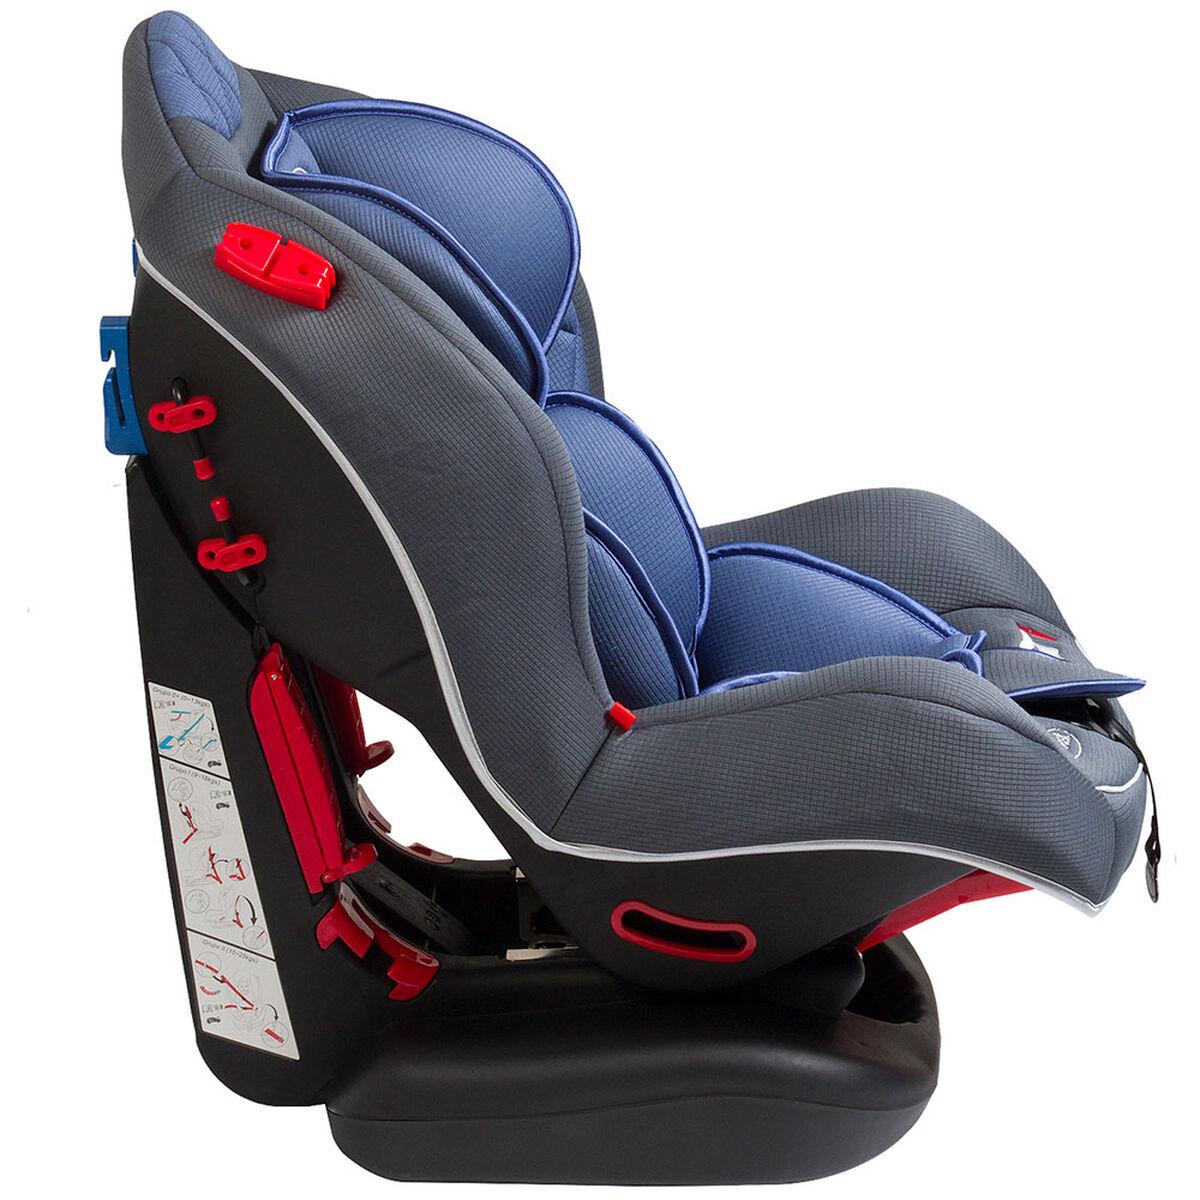 Silla para Auto Bebesit GTI MK800